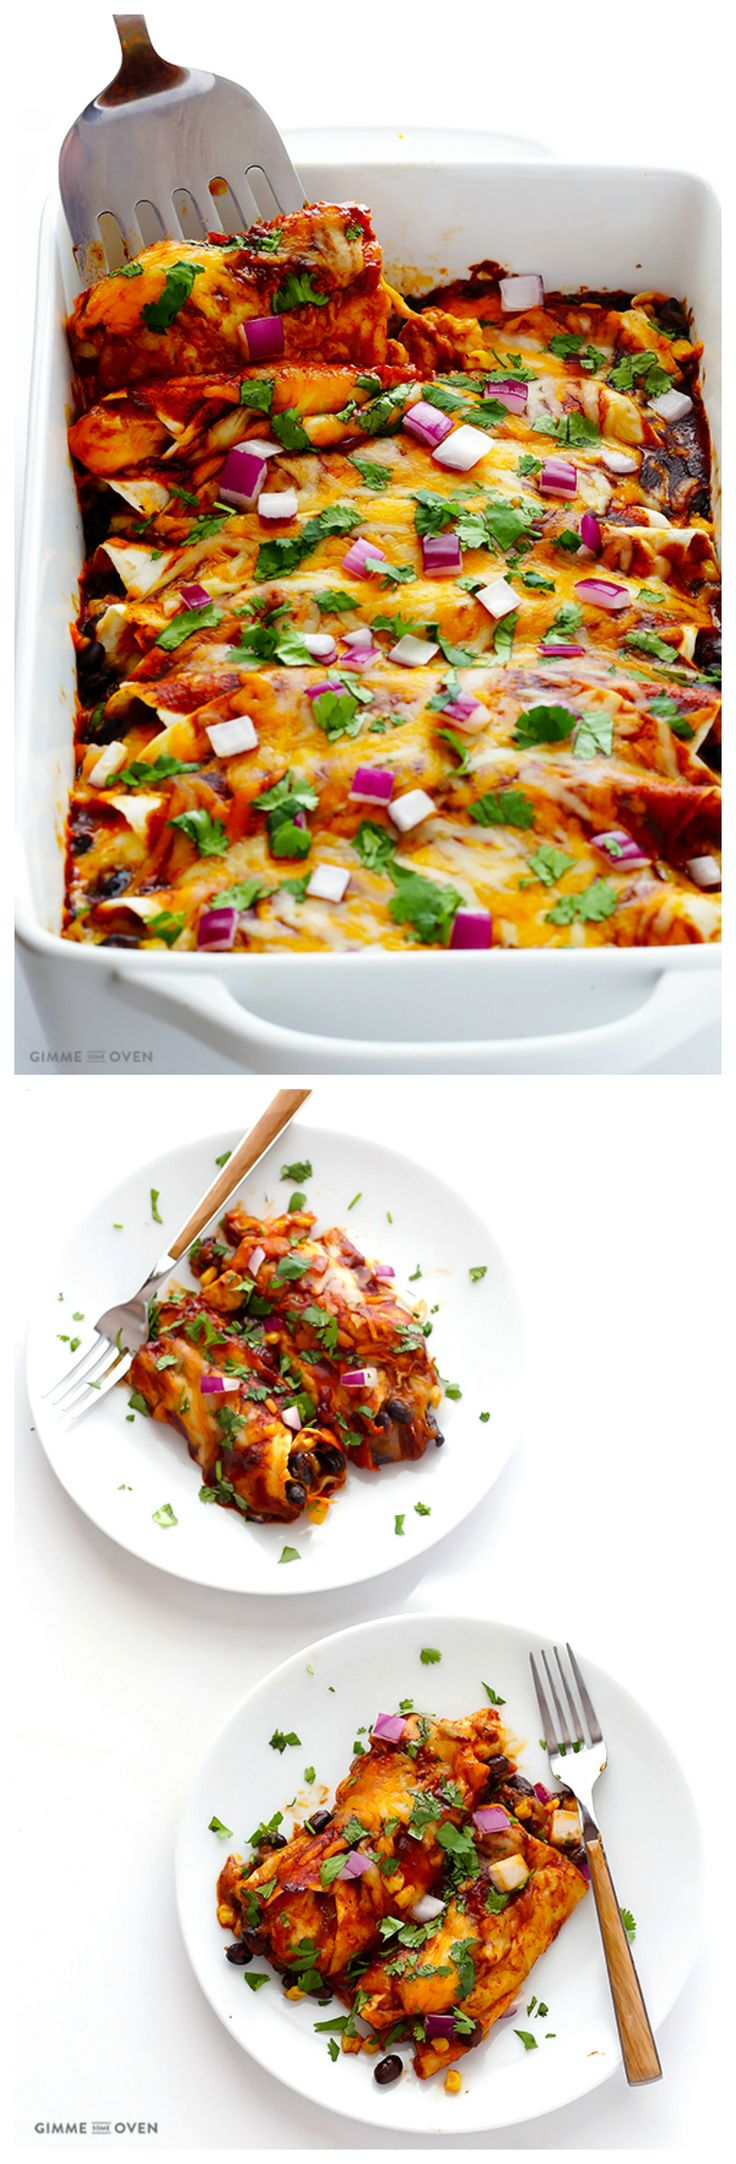 BBQ Chicken Enchiladas -- add a little bbq sauce to traditional enchiladas to kick them up a notch! | gimmesomeoven.com